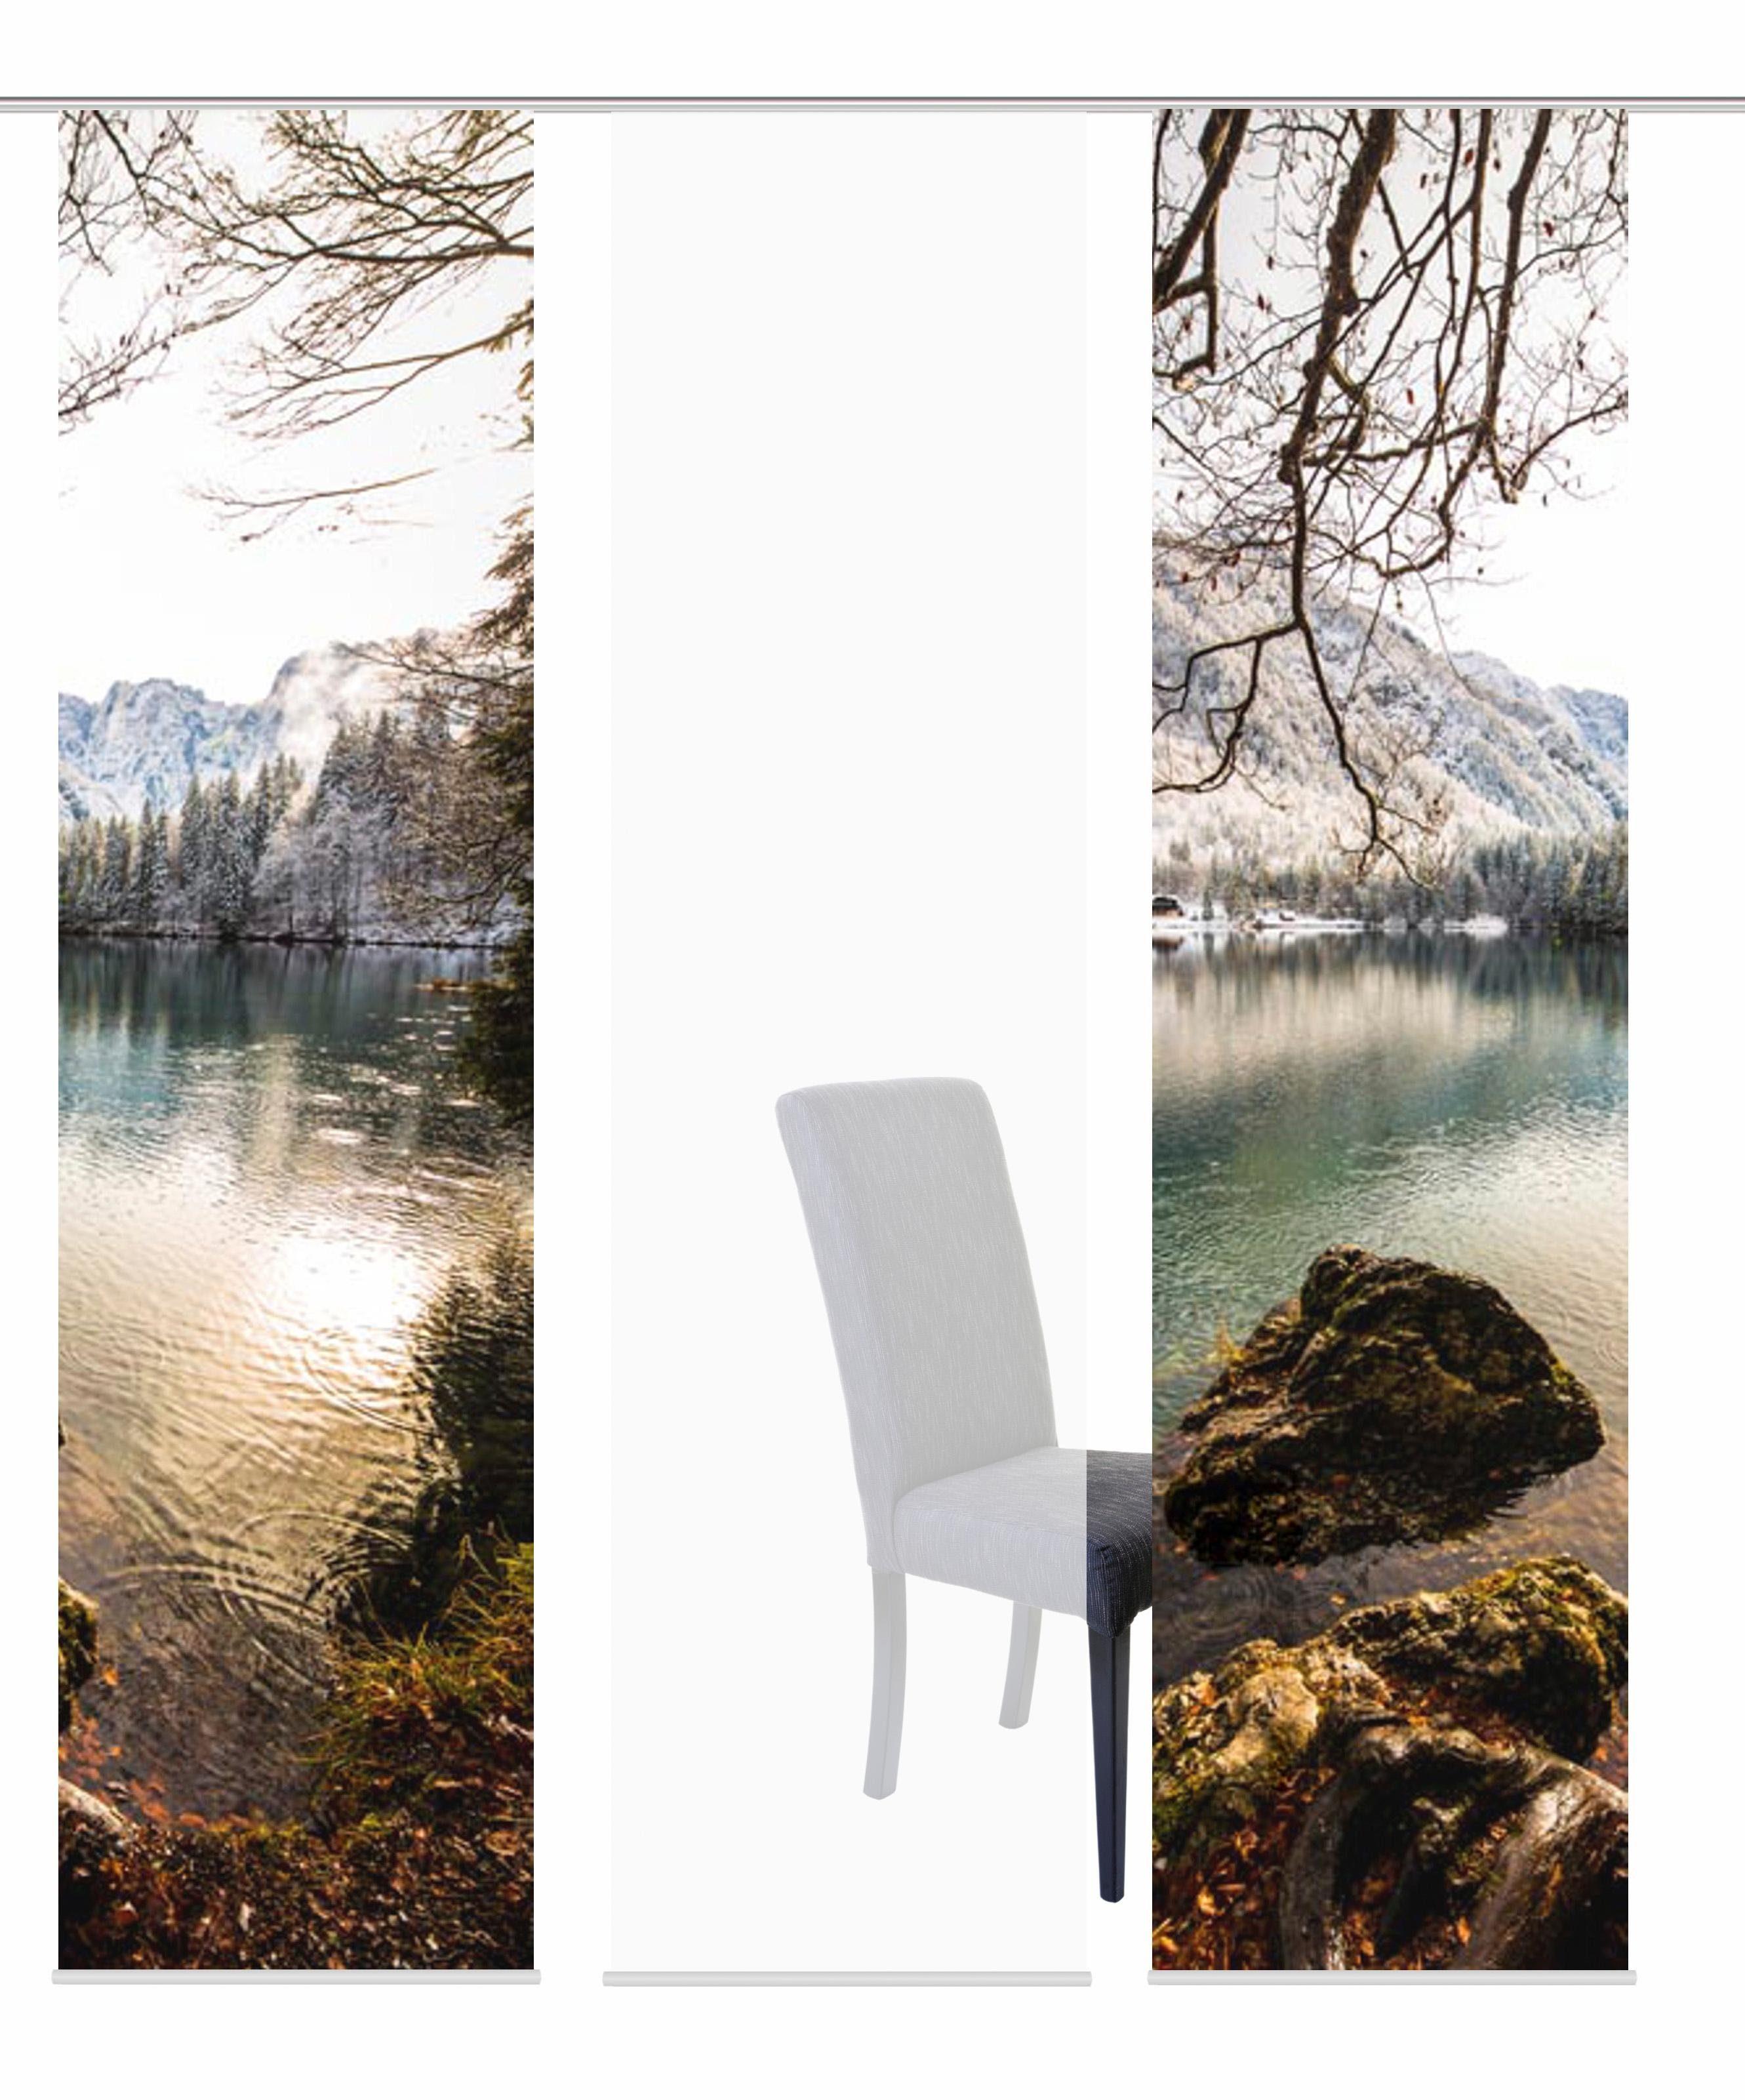 Schiebegardine »3ER SET MOUNT«, HOME WOHNIDEEN, Paneelwagen (3 Stück), Schiebevorhang 3er Set Digitaldruck